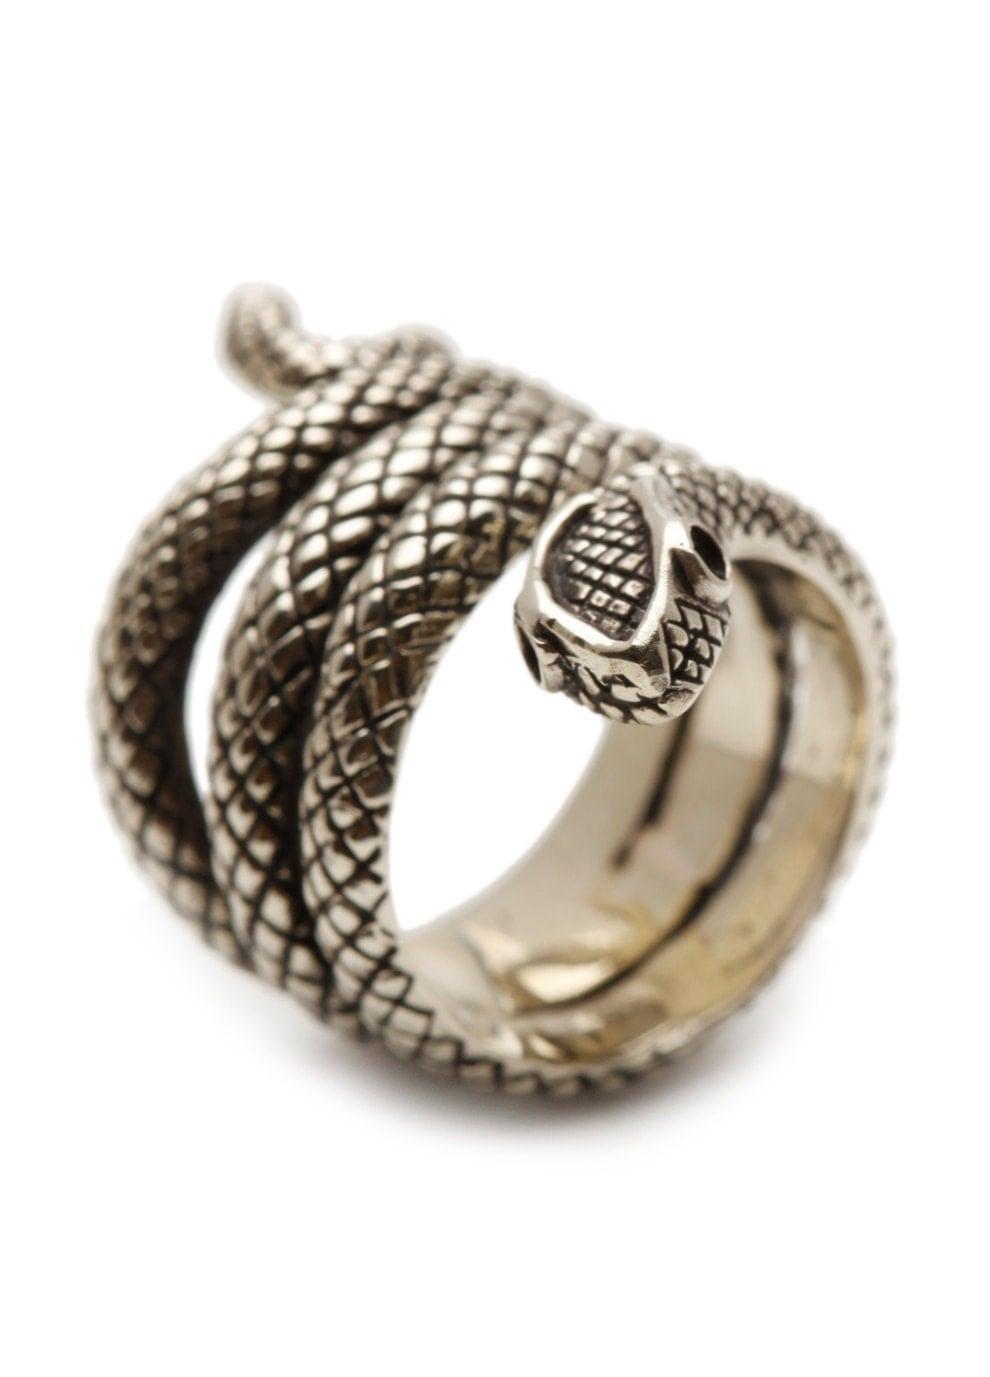 silver snake ring sterling jewelry by carpediemjewellery